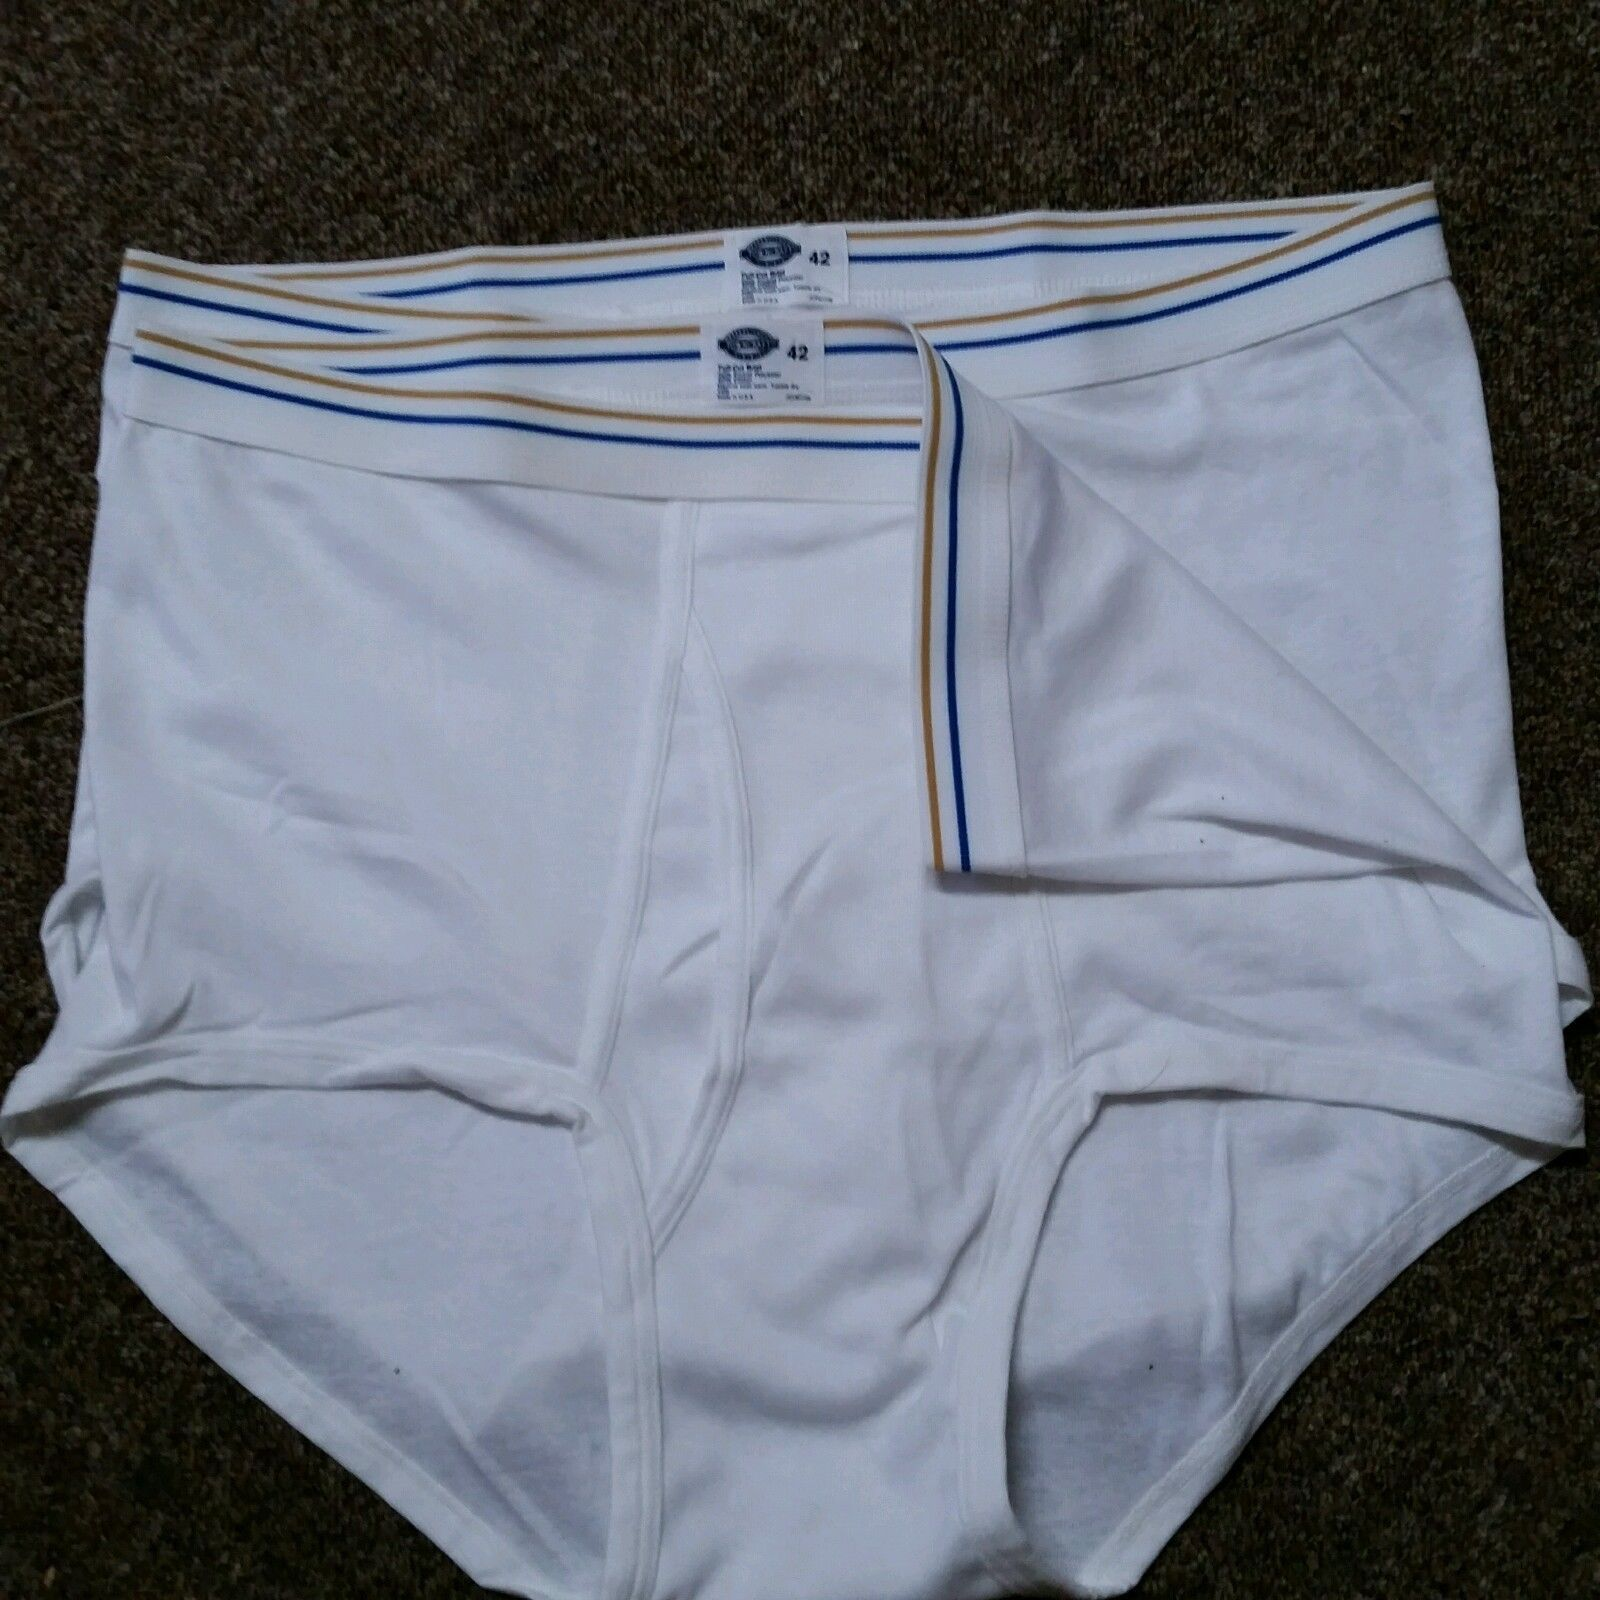 016ea3ddea30 VTG (2) Towncraft Briefs Underwear JC Penney and 50 similar items